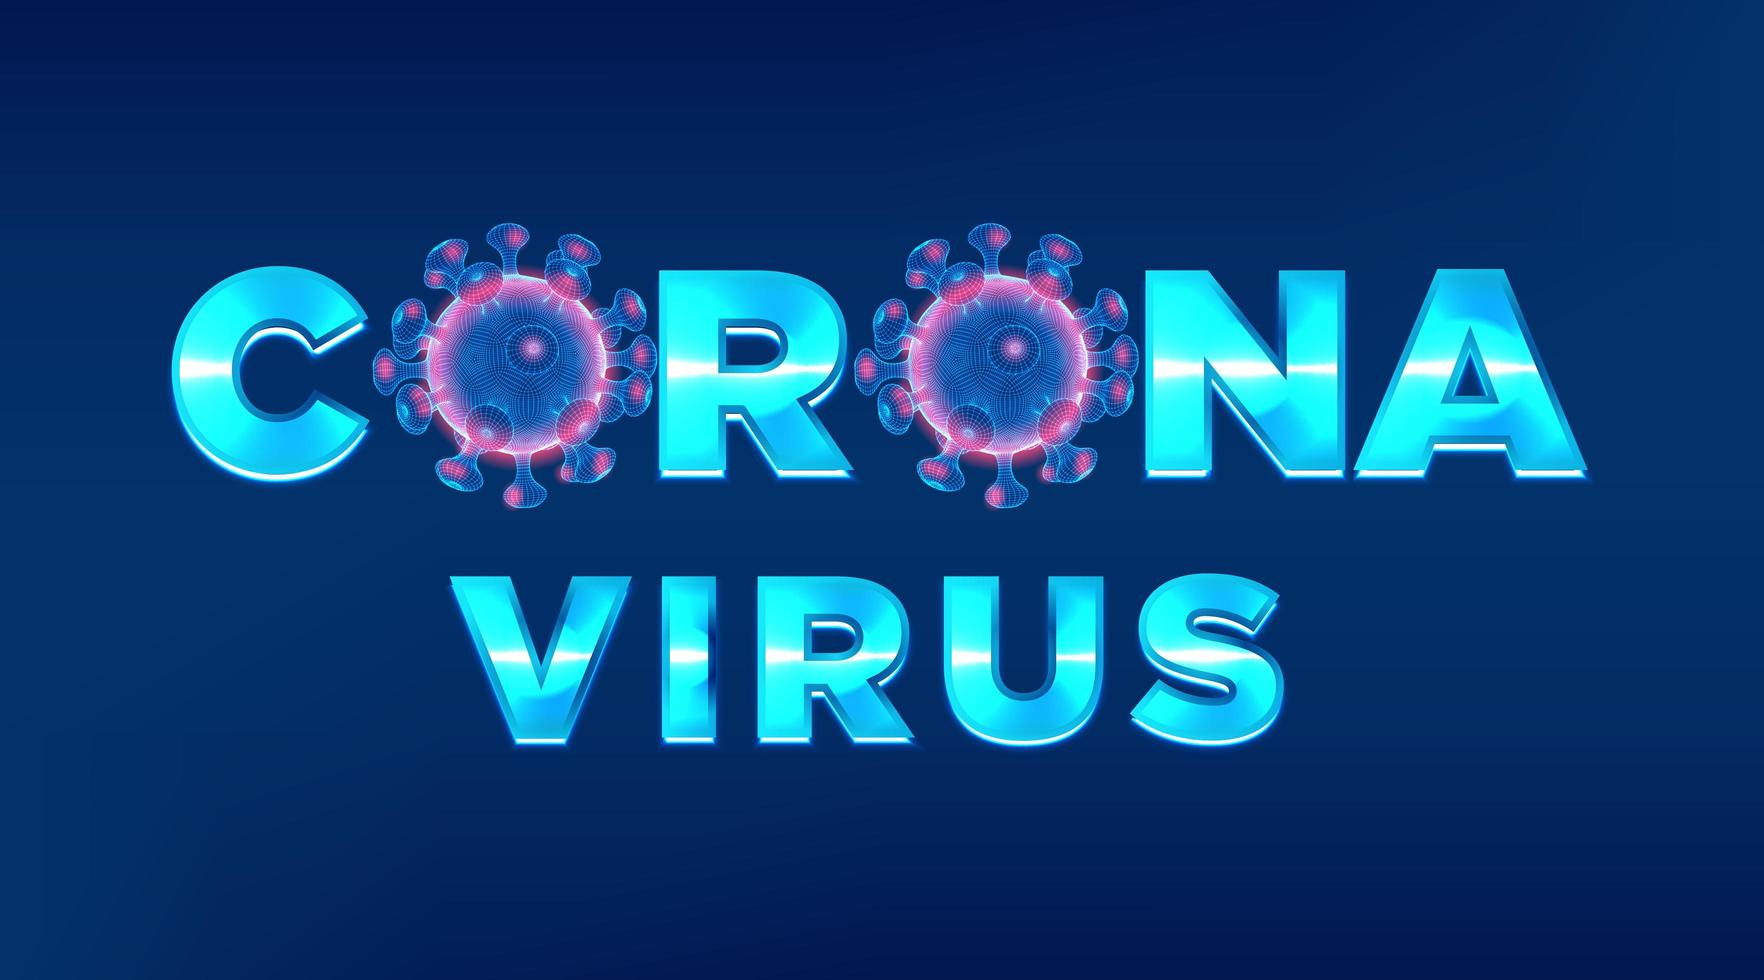 Coronavirus-Titel in hellblauen Buchstaben vektor